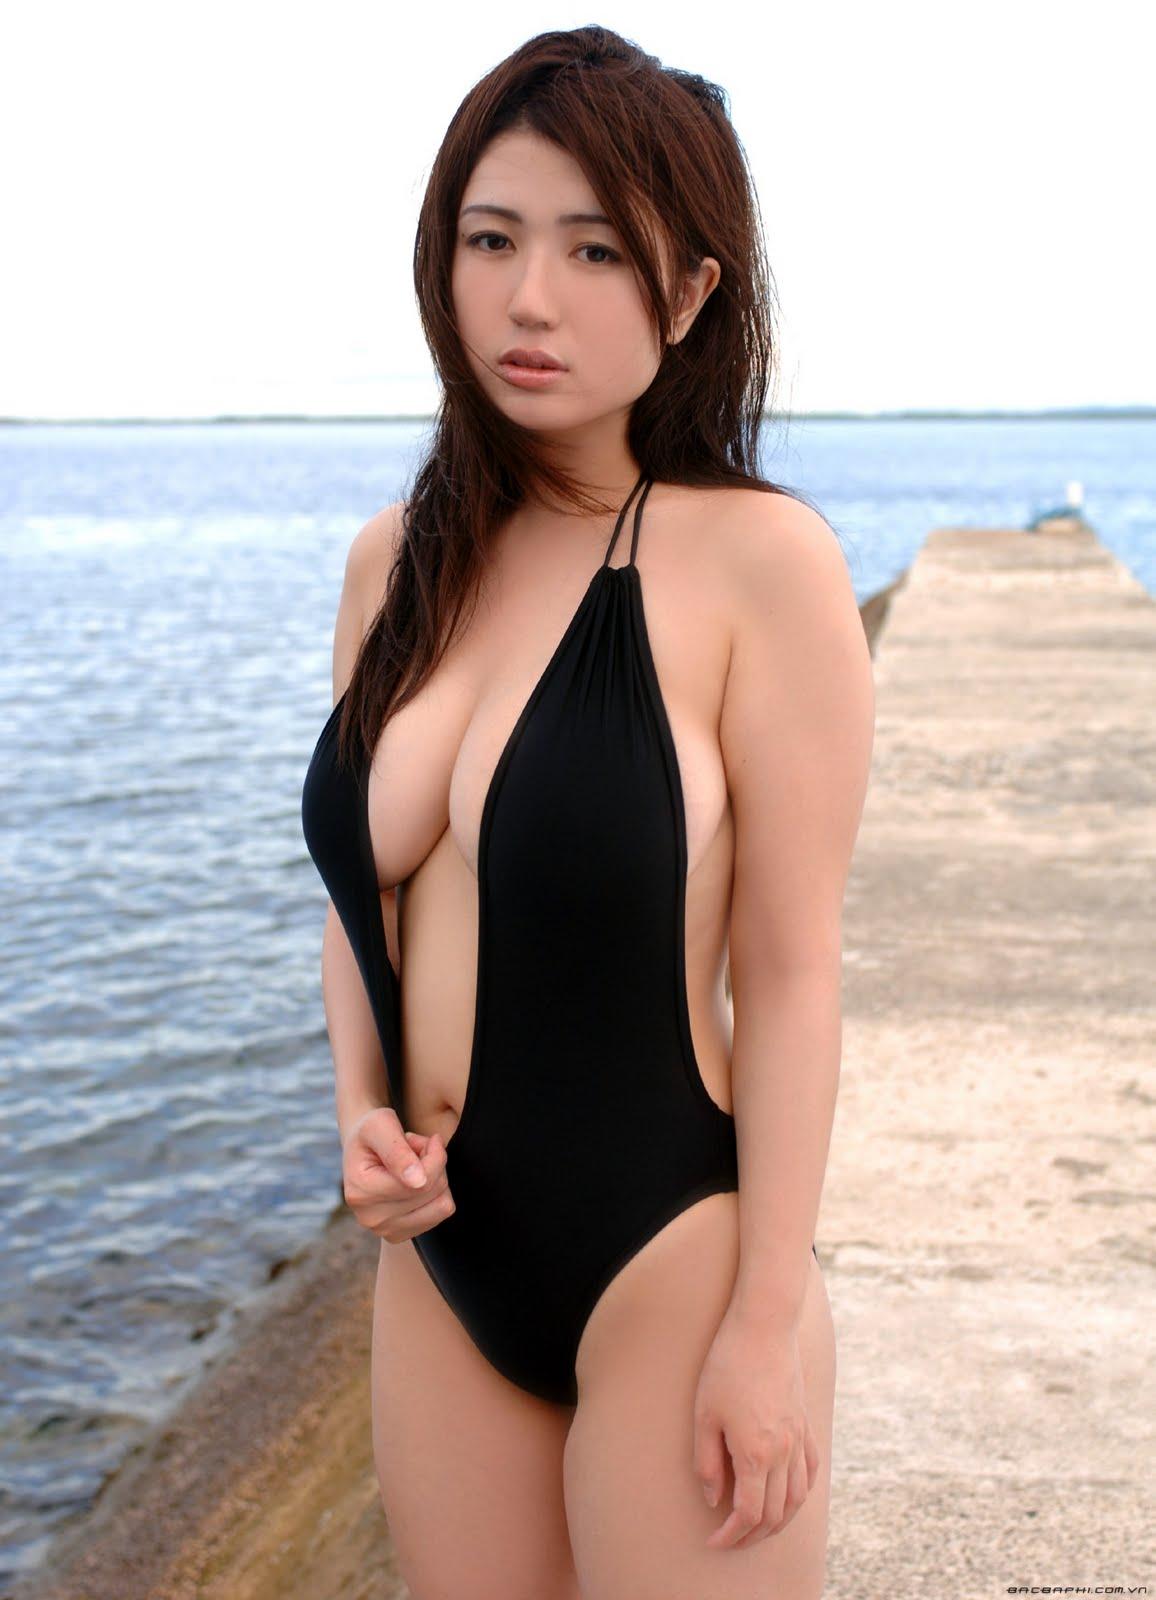 nonami takizawa nonami takizawa ii la enfermera más sexy nonami